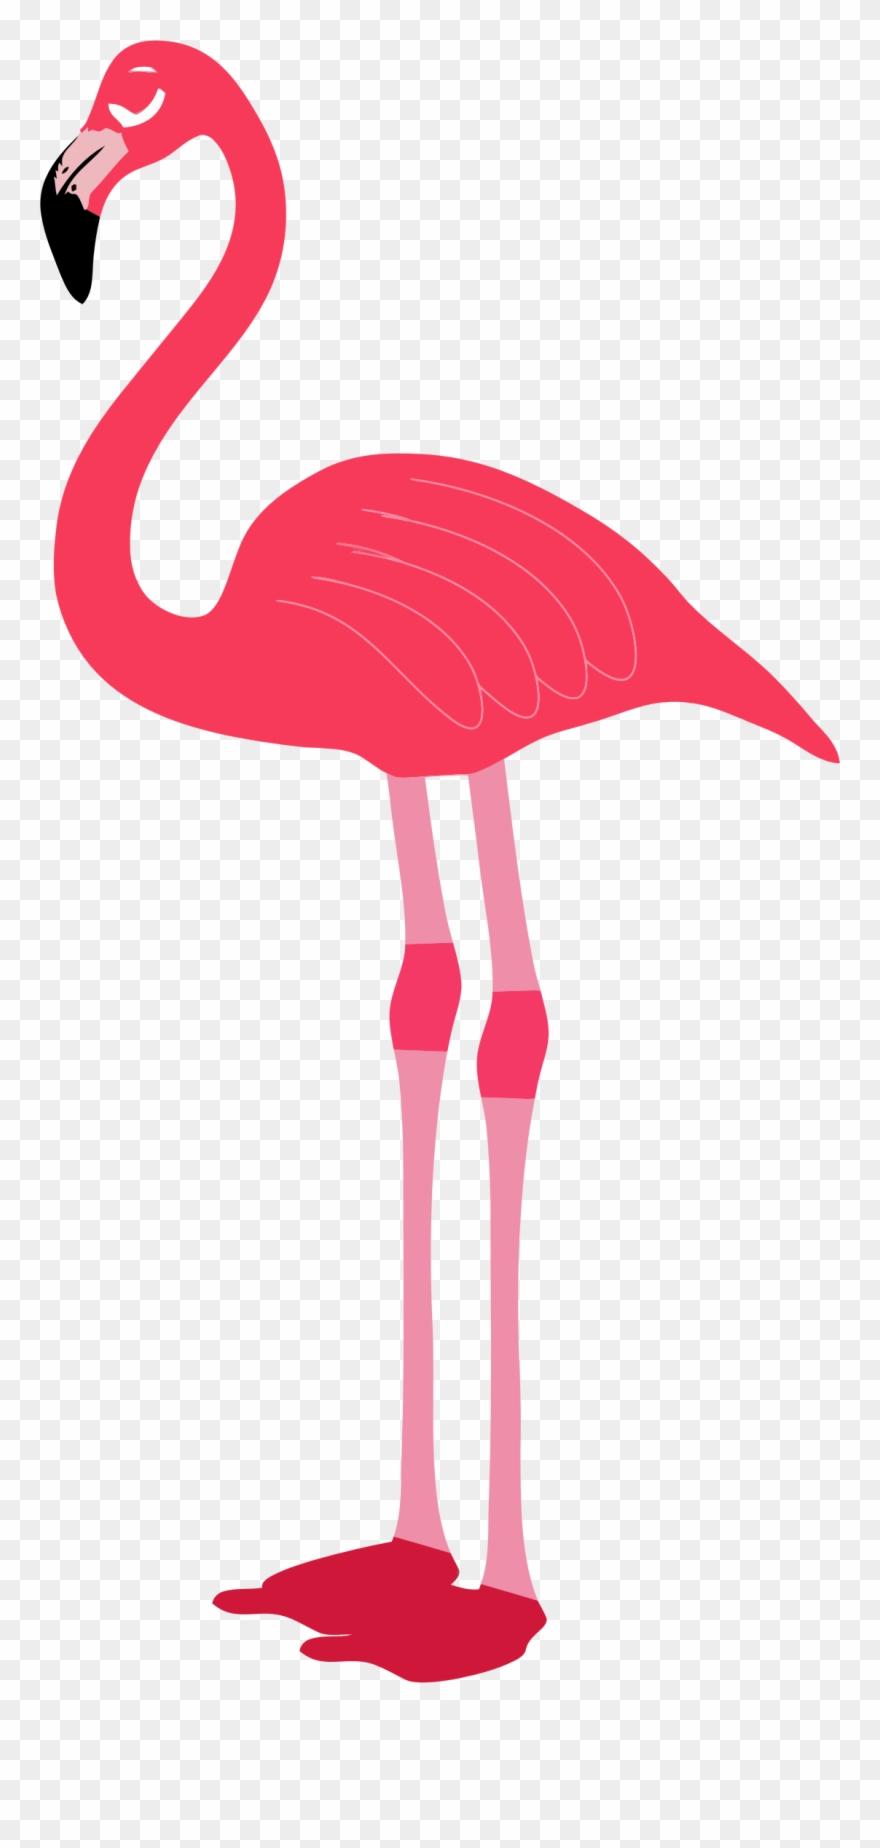 Flamingo clipart transparent background clip art library stock Clipart Flamingo Clipartix - Transparent Background Flamingo Png ... clip art library stock